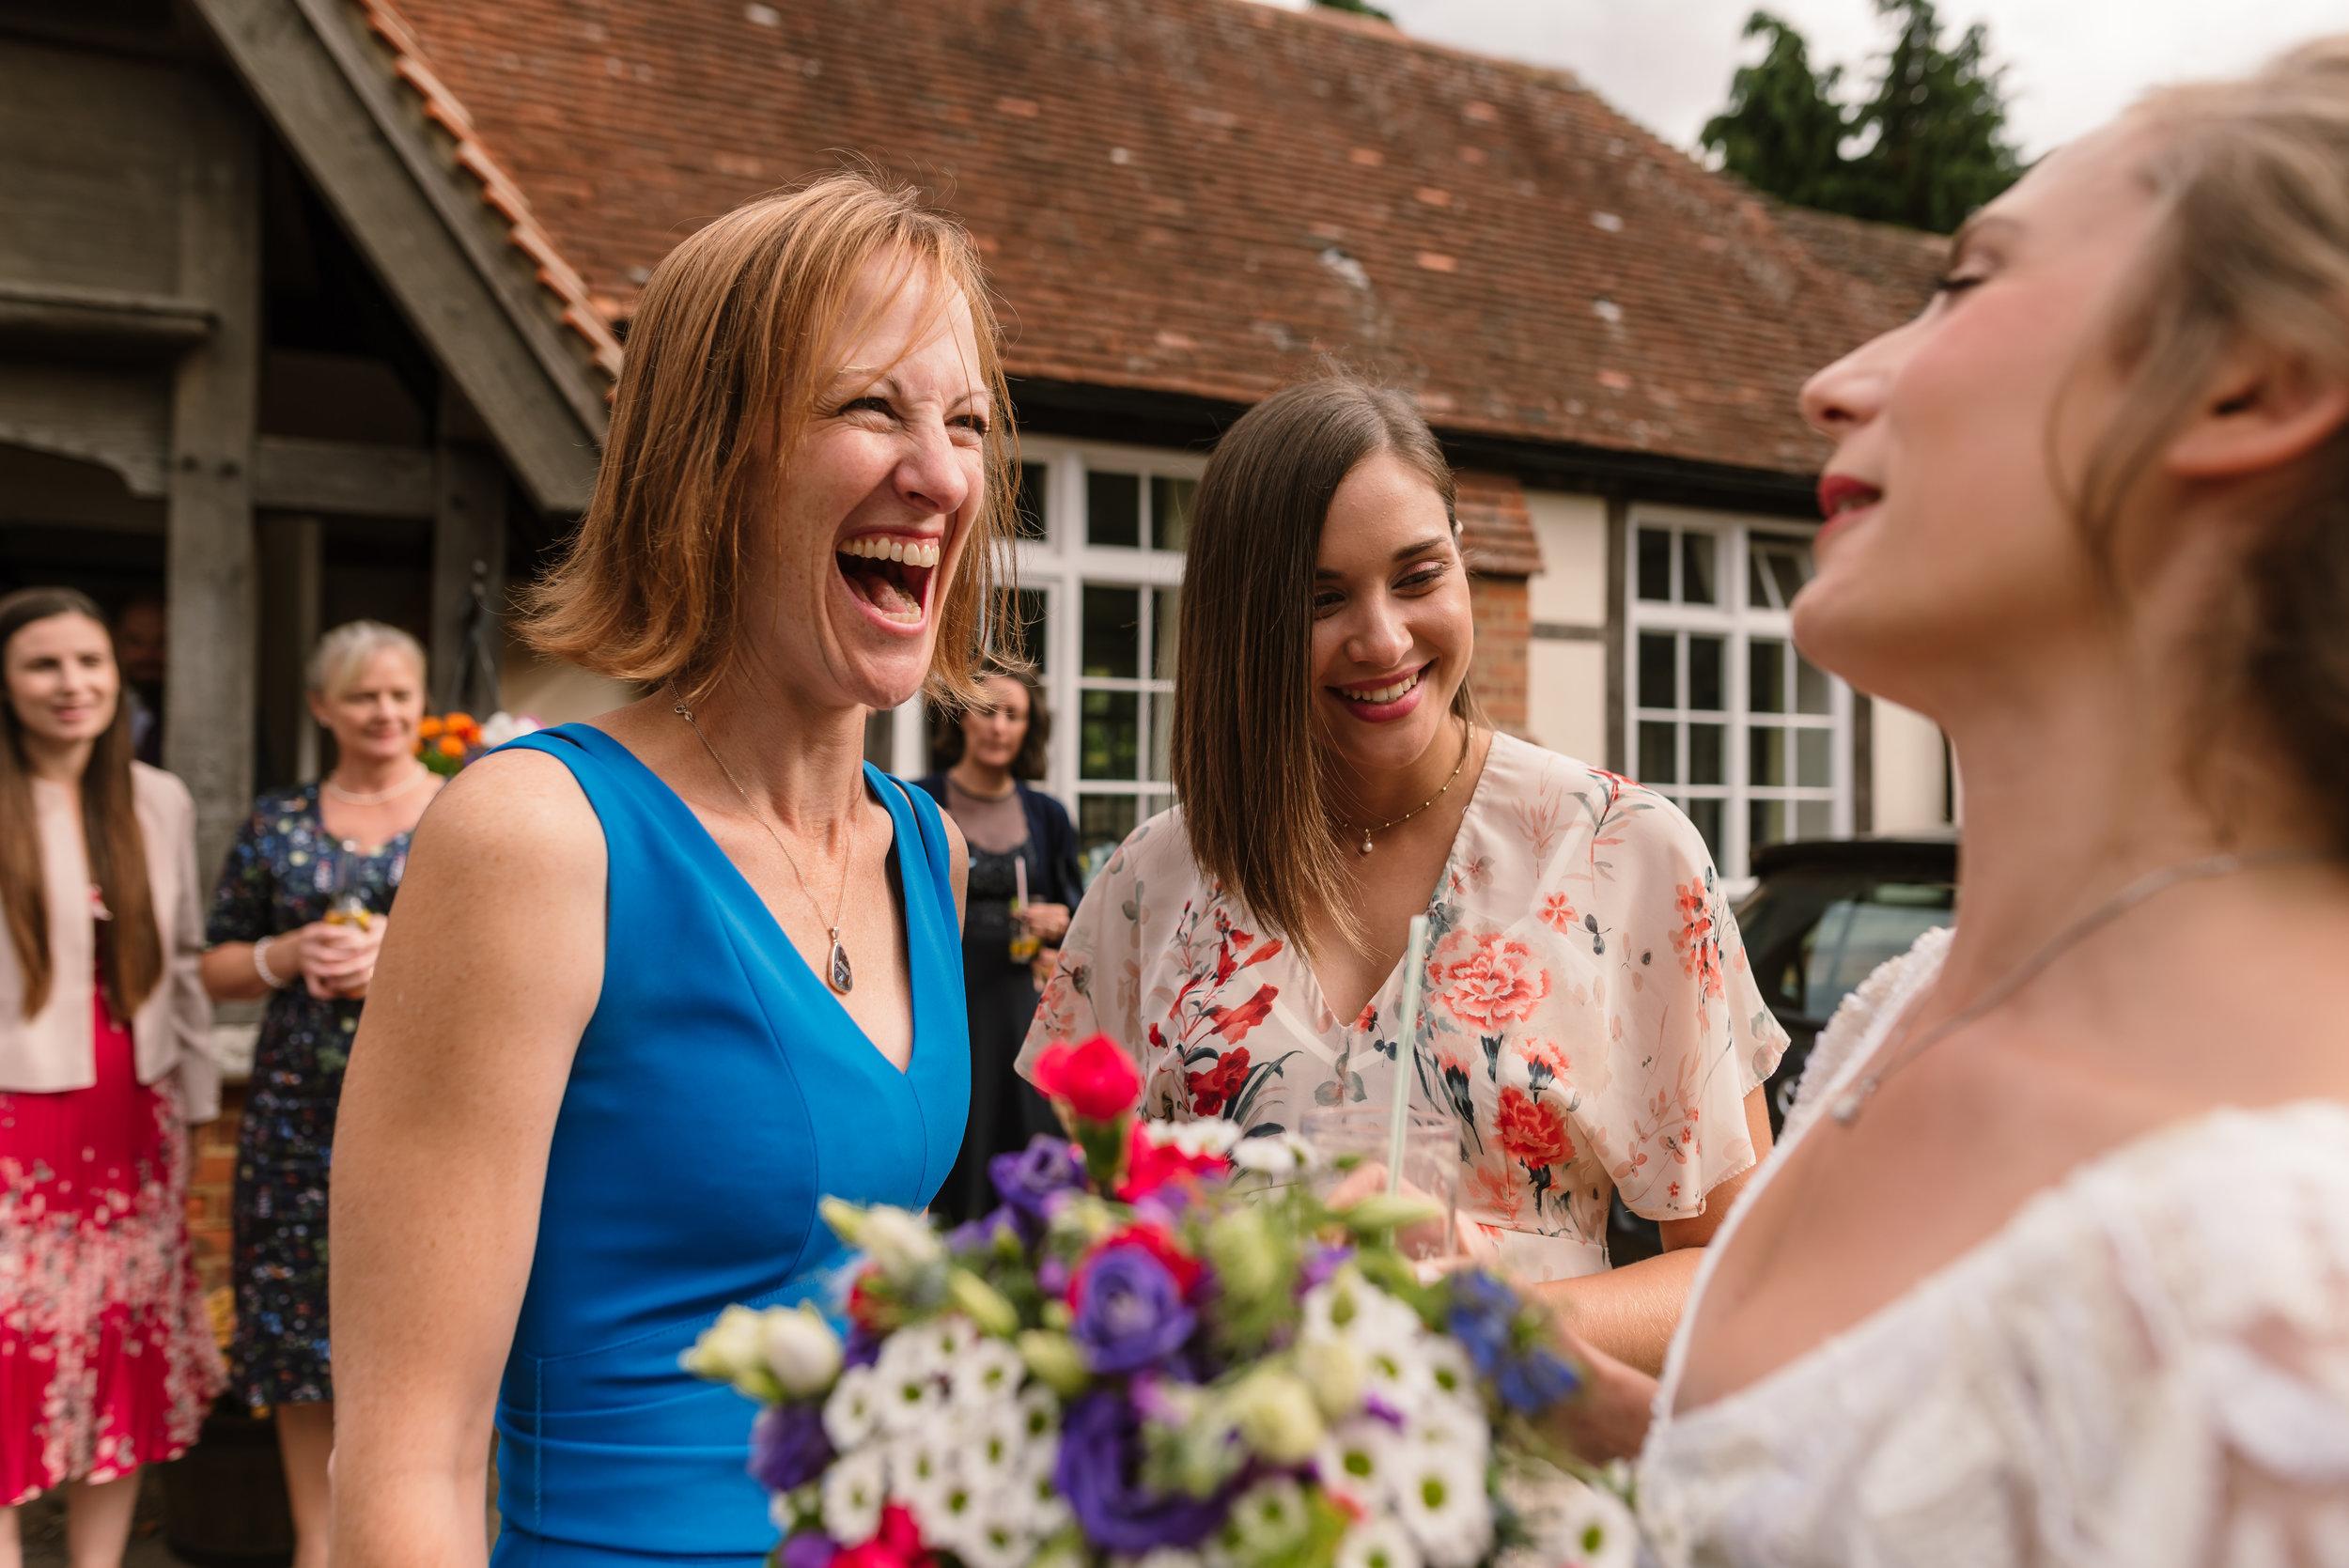 New Forest Village Hall Wedding / Sarah-Fishlock-Photography / Hampshire-Wedding-Photographer-Hampshire / hook-village-hall-wedding